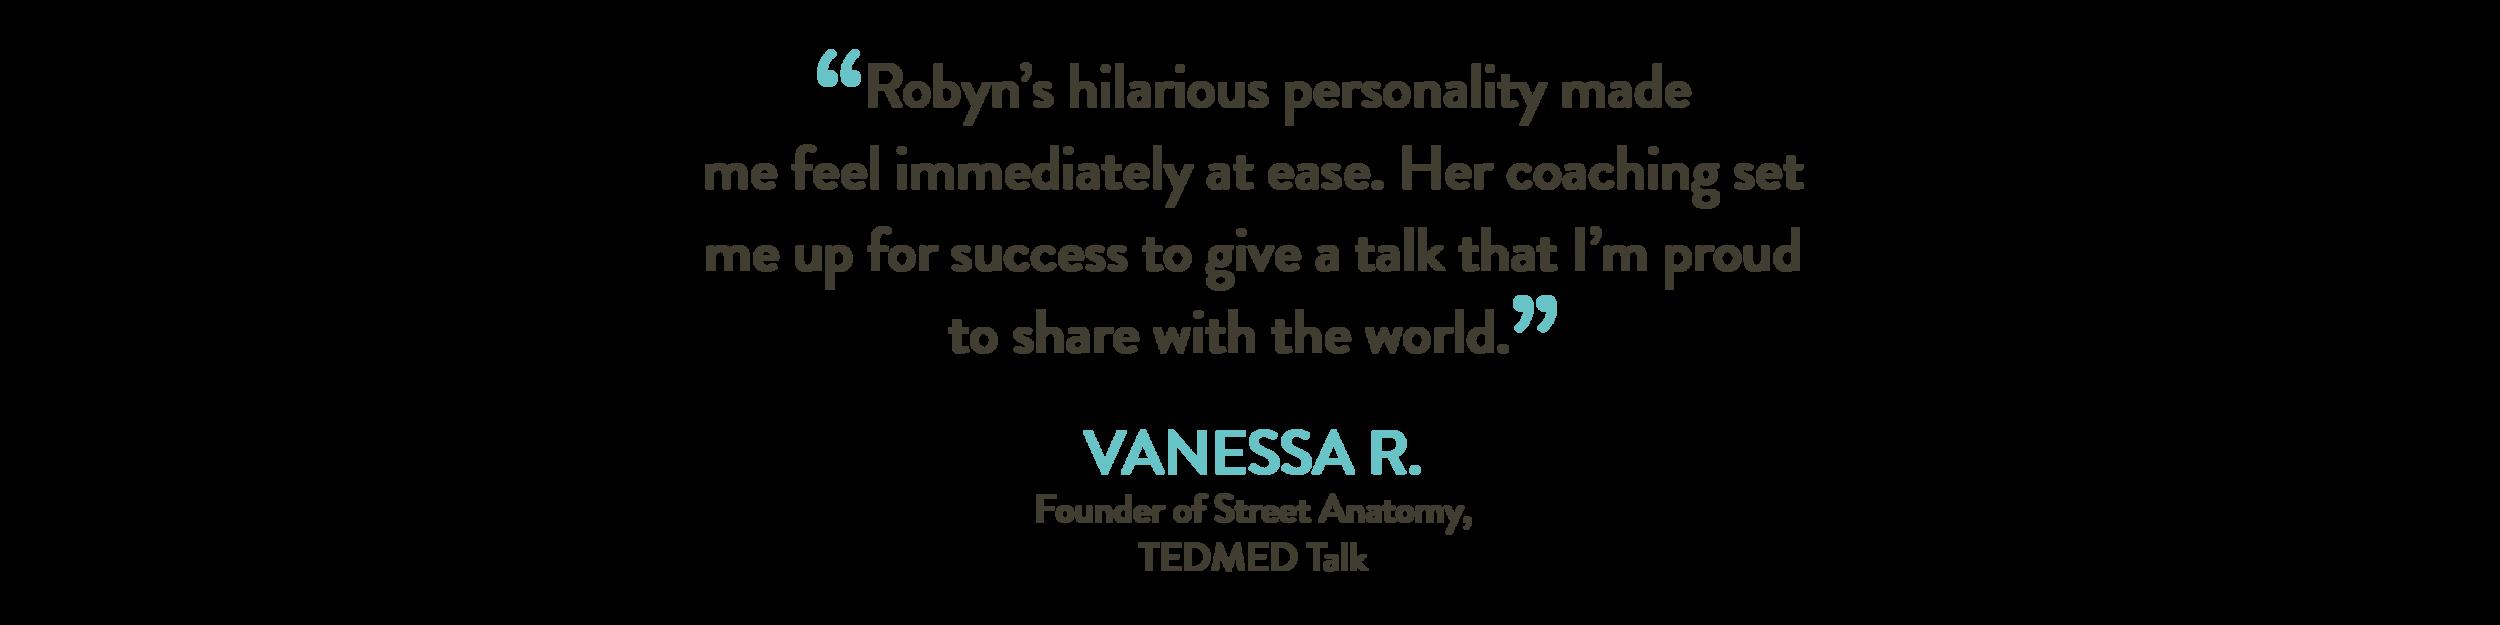 5_RLS_Testimonials_Coach_Vanessa R.png